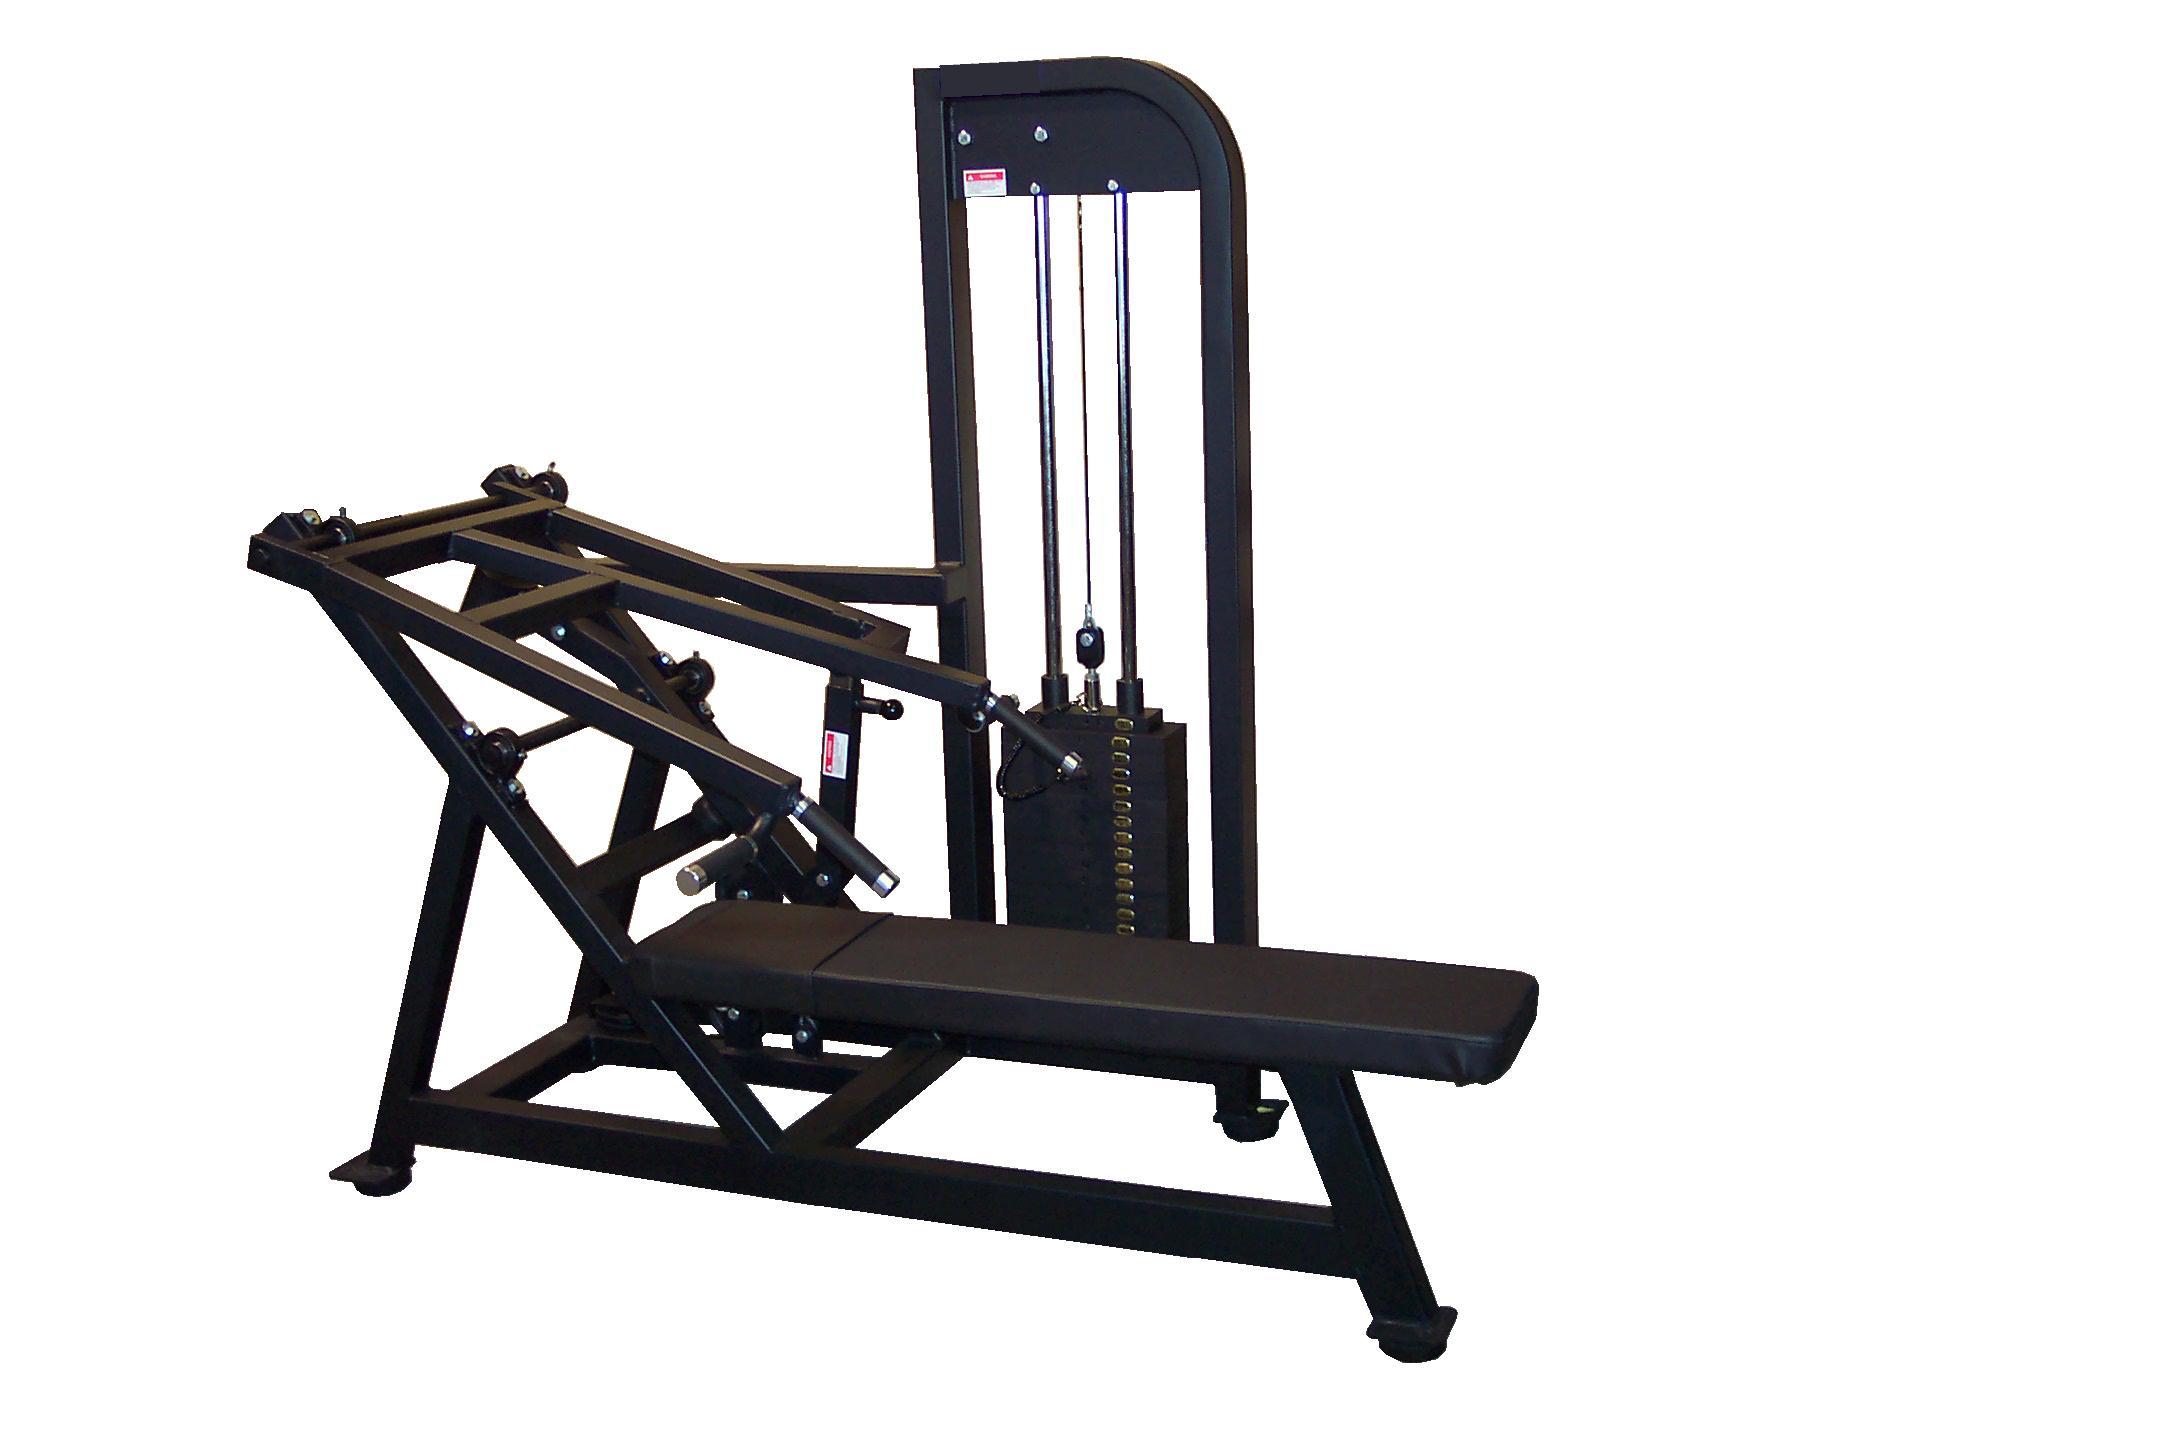 MAX#HCS3 Bench Press (200lbs)